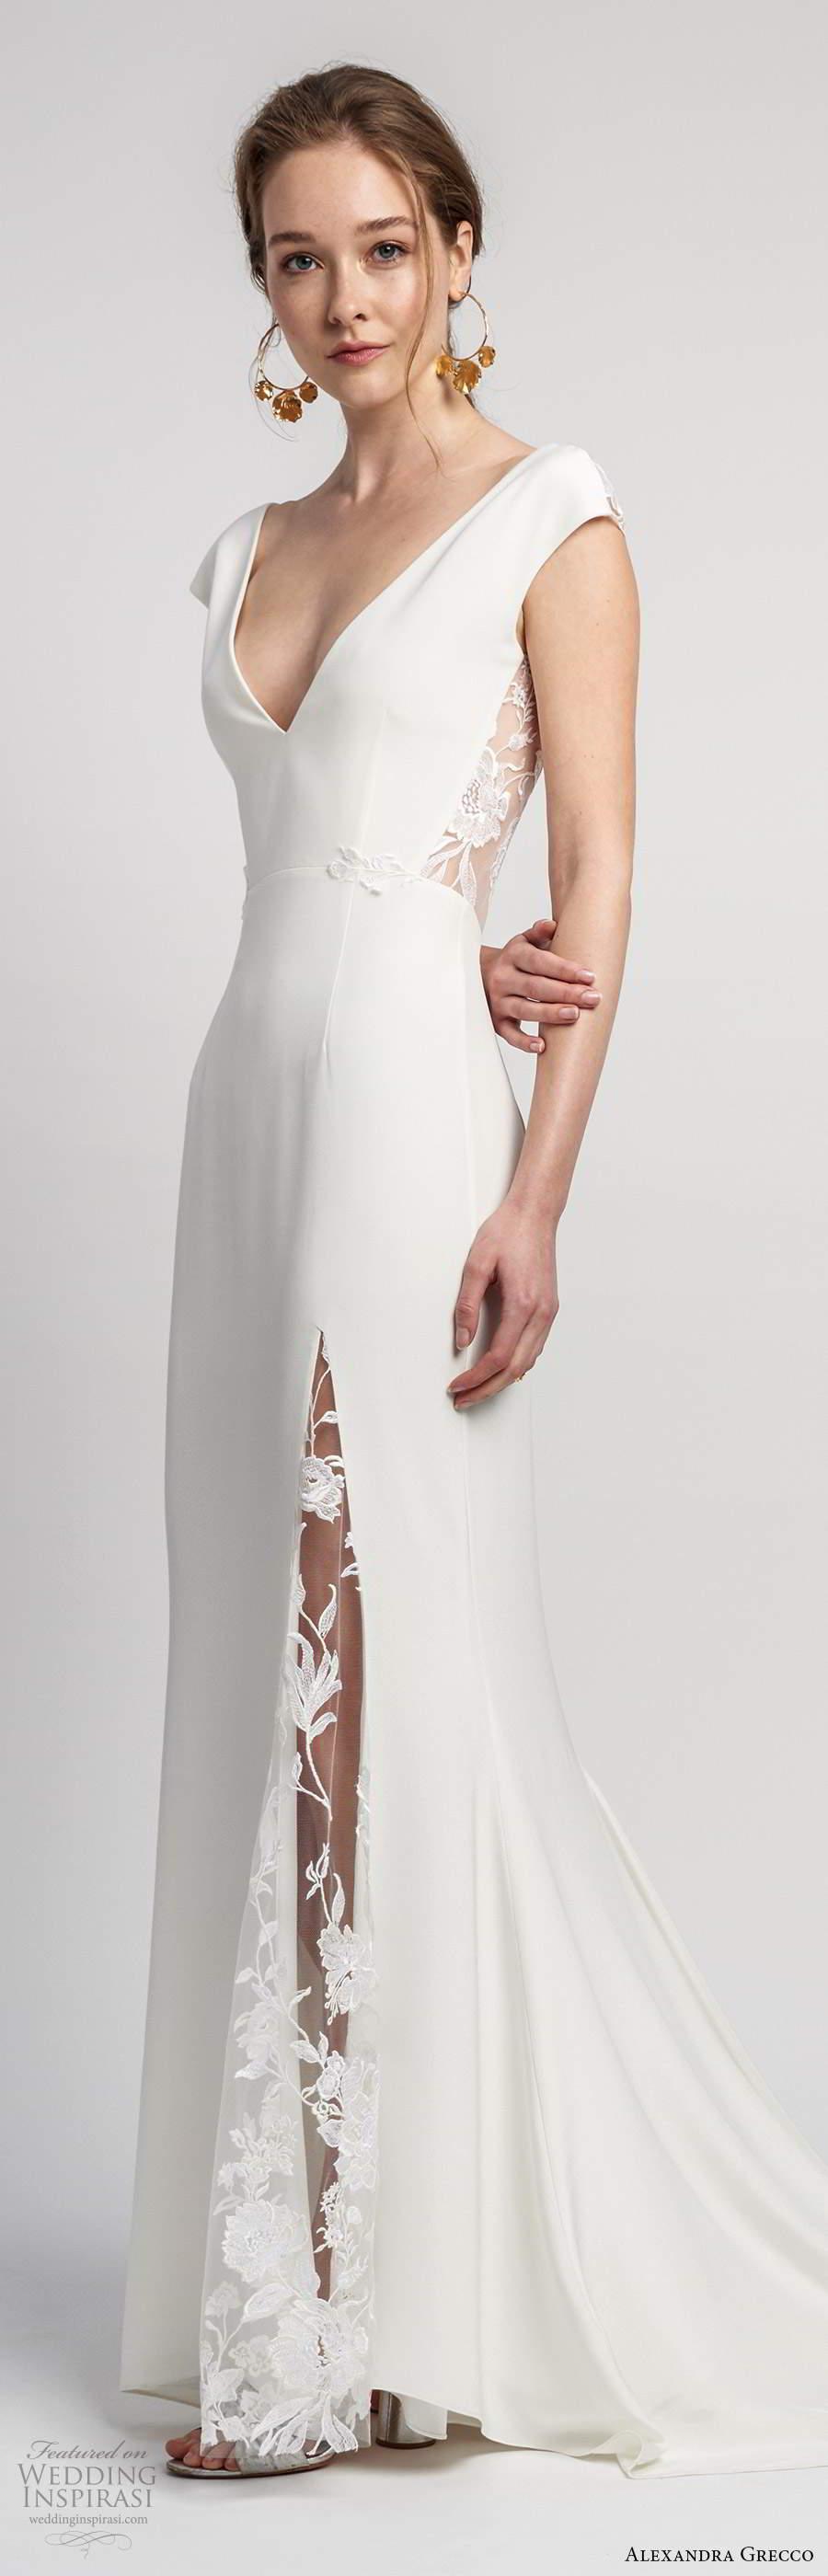 alexandra grecco 2020 bridal cap sleeves deep v neckline clean minimalist modified a line wedding dress slit skirt sheer v back cathedral train (7) lv